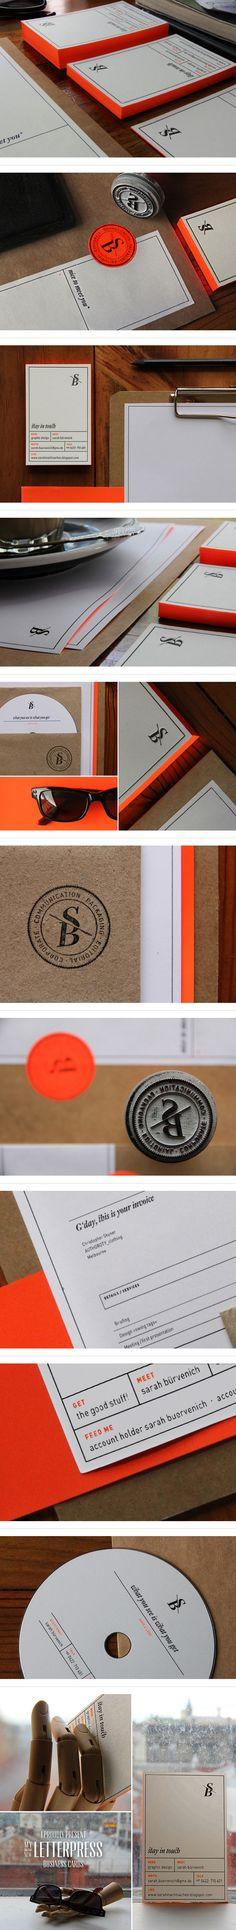 Sarah Buervenich Identity | #stationary #corporate #design #corporatedesign #identity #branding #marketing < repinned by www.BlickeDeeler.de | Take a look at www.LogoGestaltung-Hamburg.de